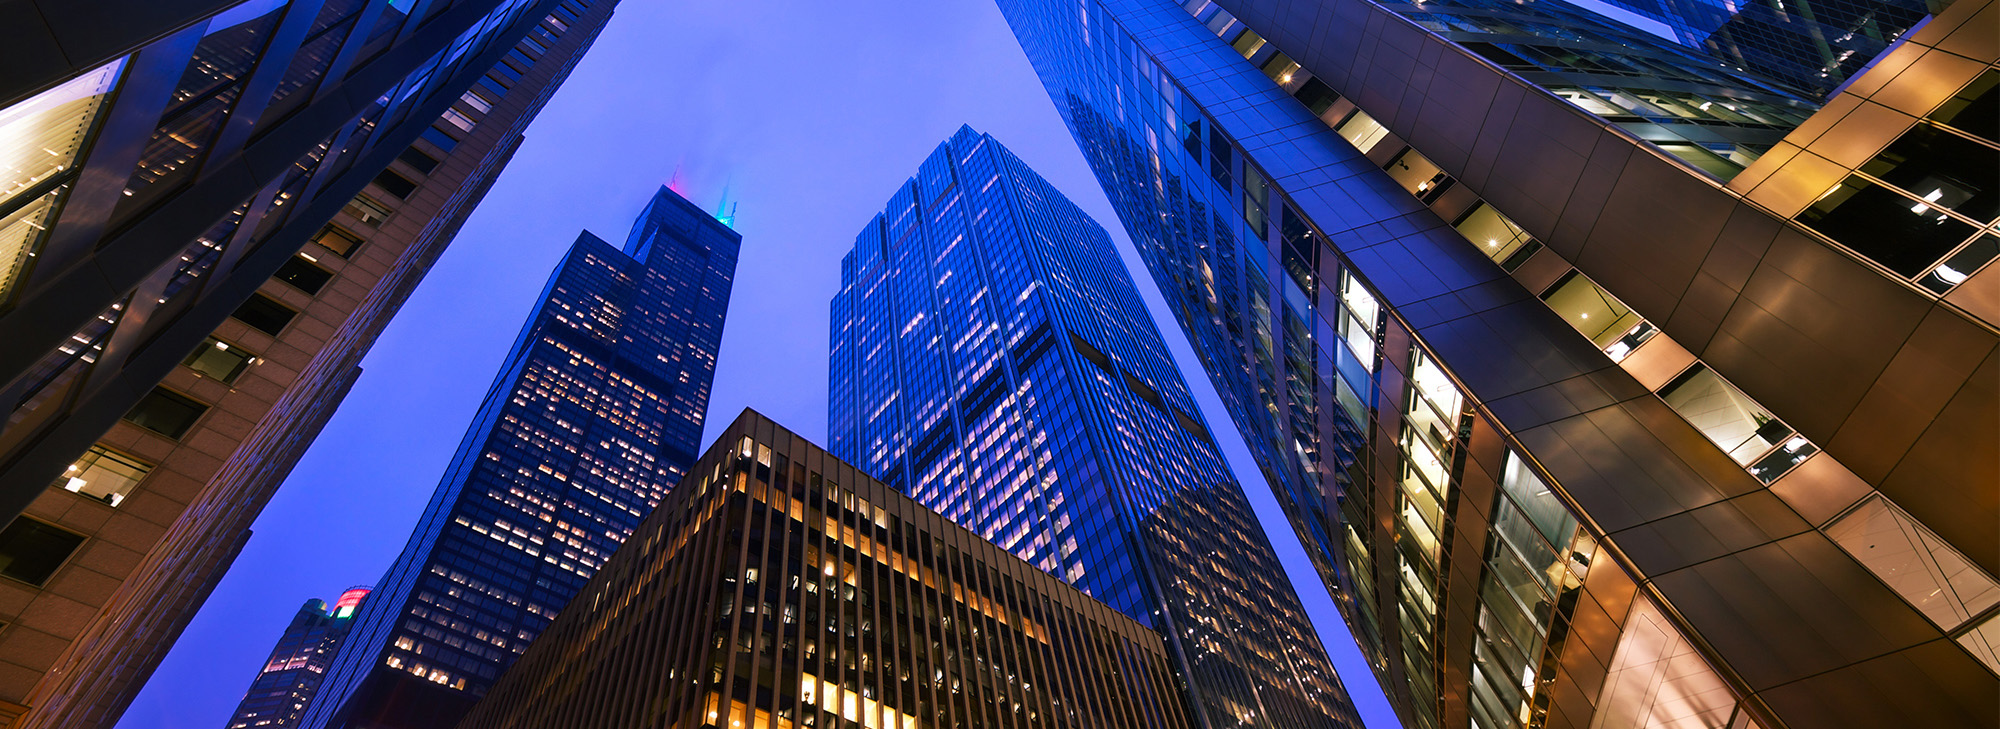 Arts & Entrepreneurship in Chicago